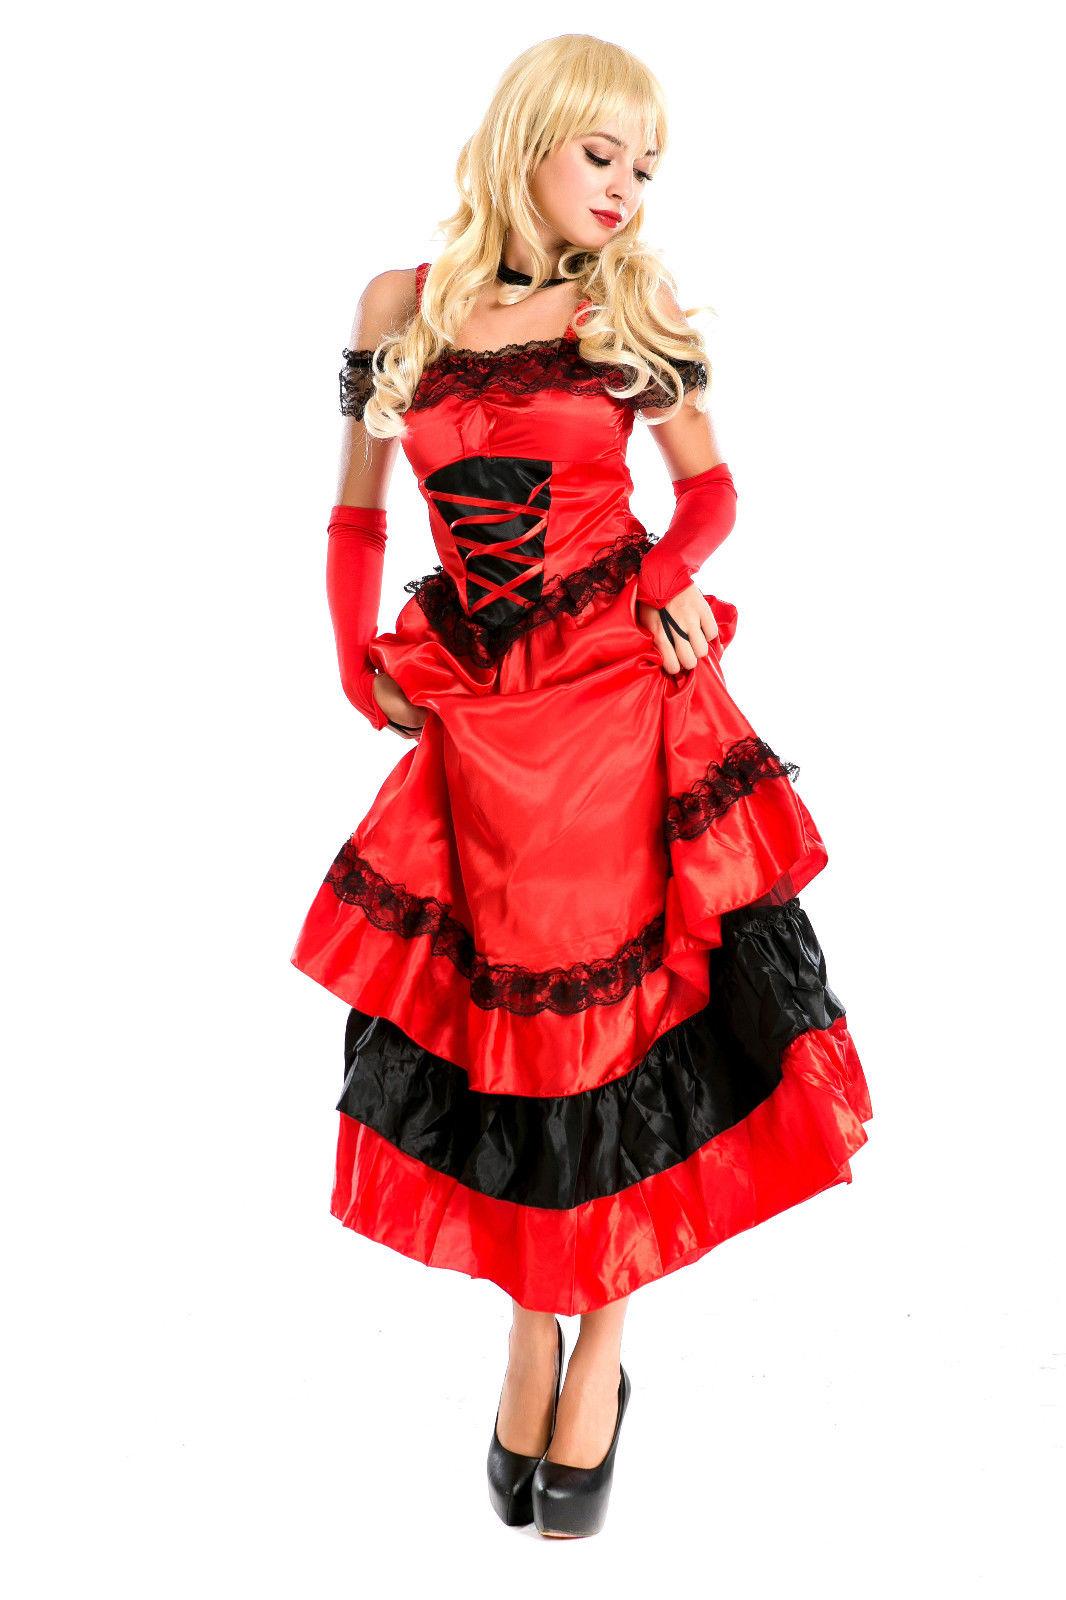 Adult Ladies Spanish Senorita Fancy Dress Flamenco Dancer Costume UK Sizes 8-16